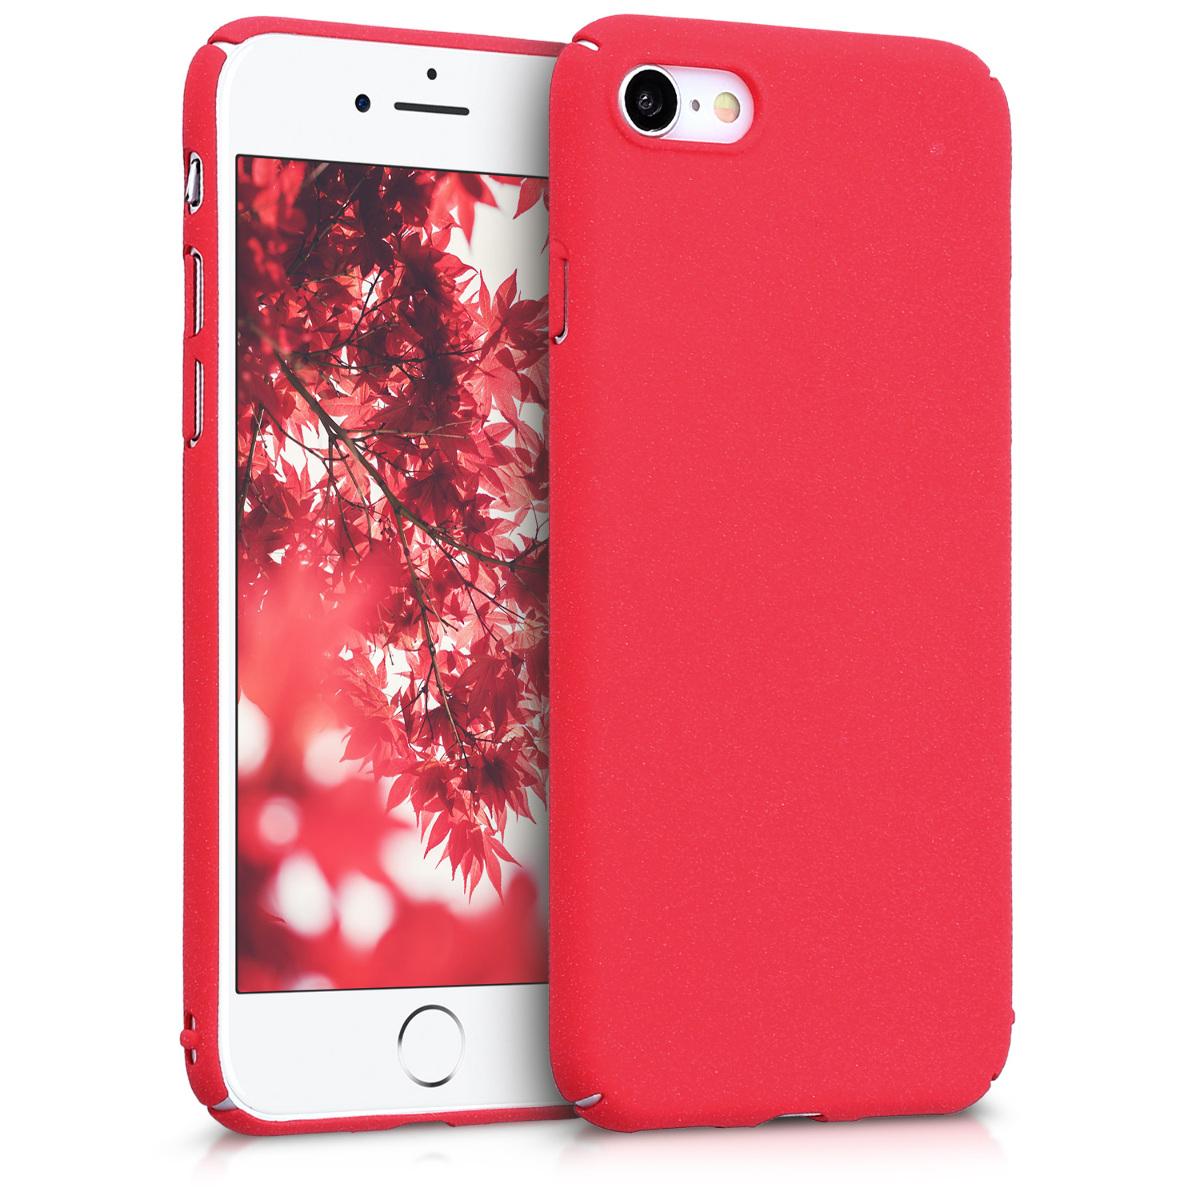 KW Slim Anti-Slip Cover - Σκληρή Θήκη Καουτσούκ iPhone 8 / 7 - Metallic Dark Red (43629.36)